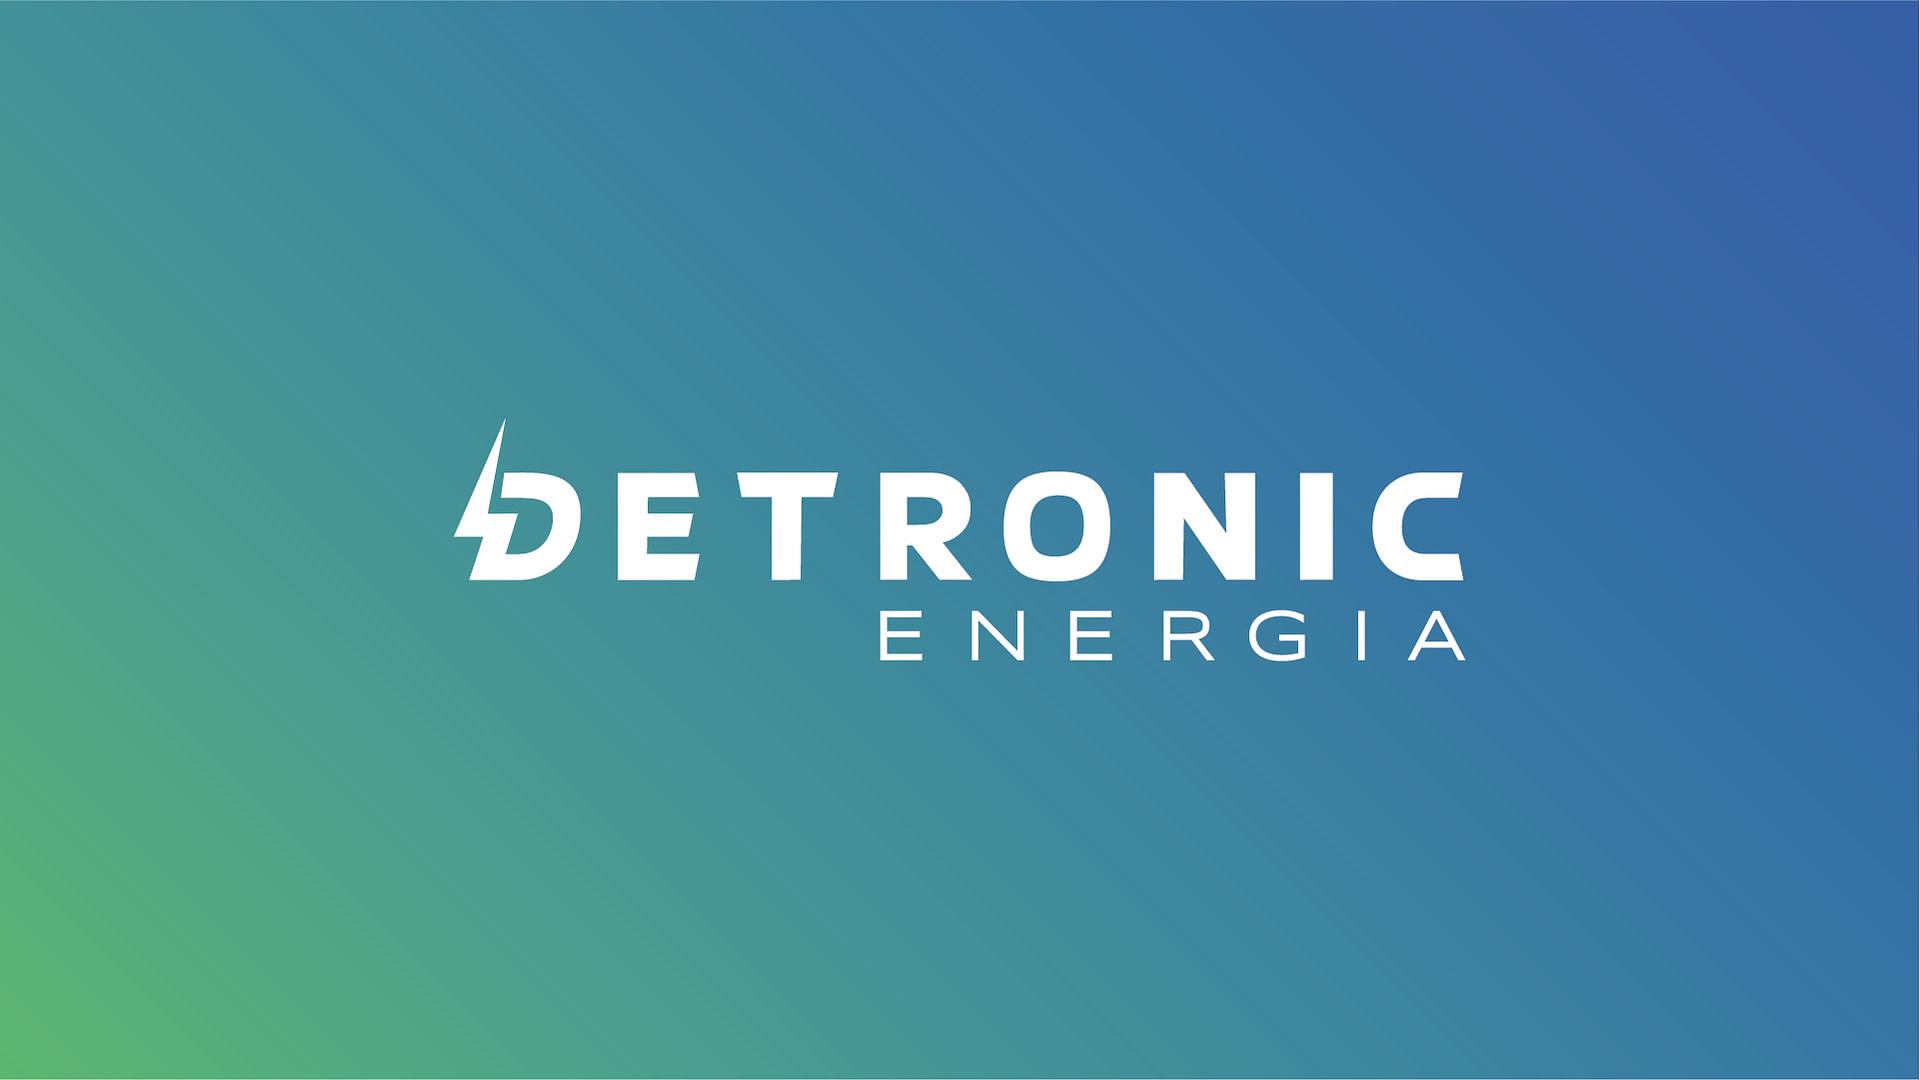 Foto notícia - Detronic Energia